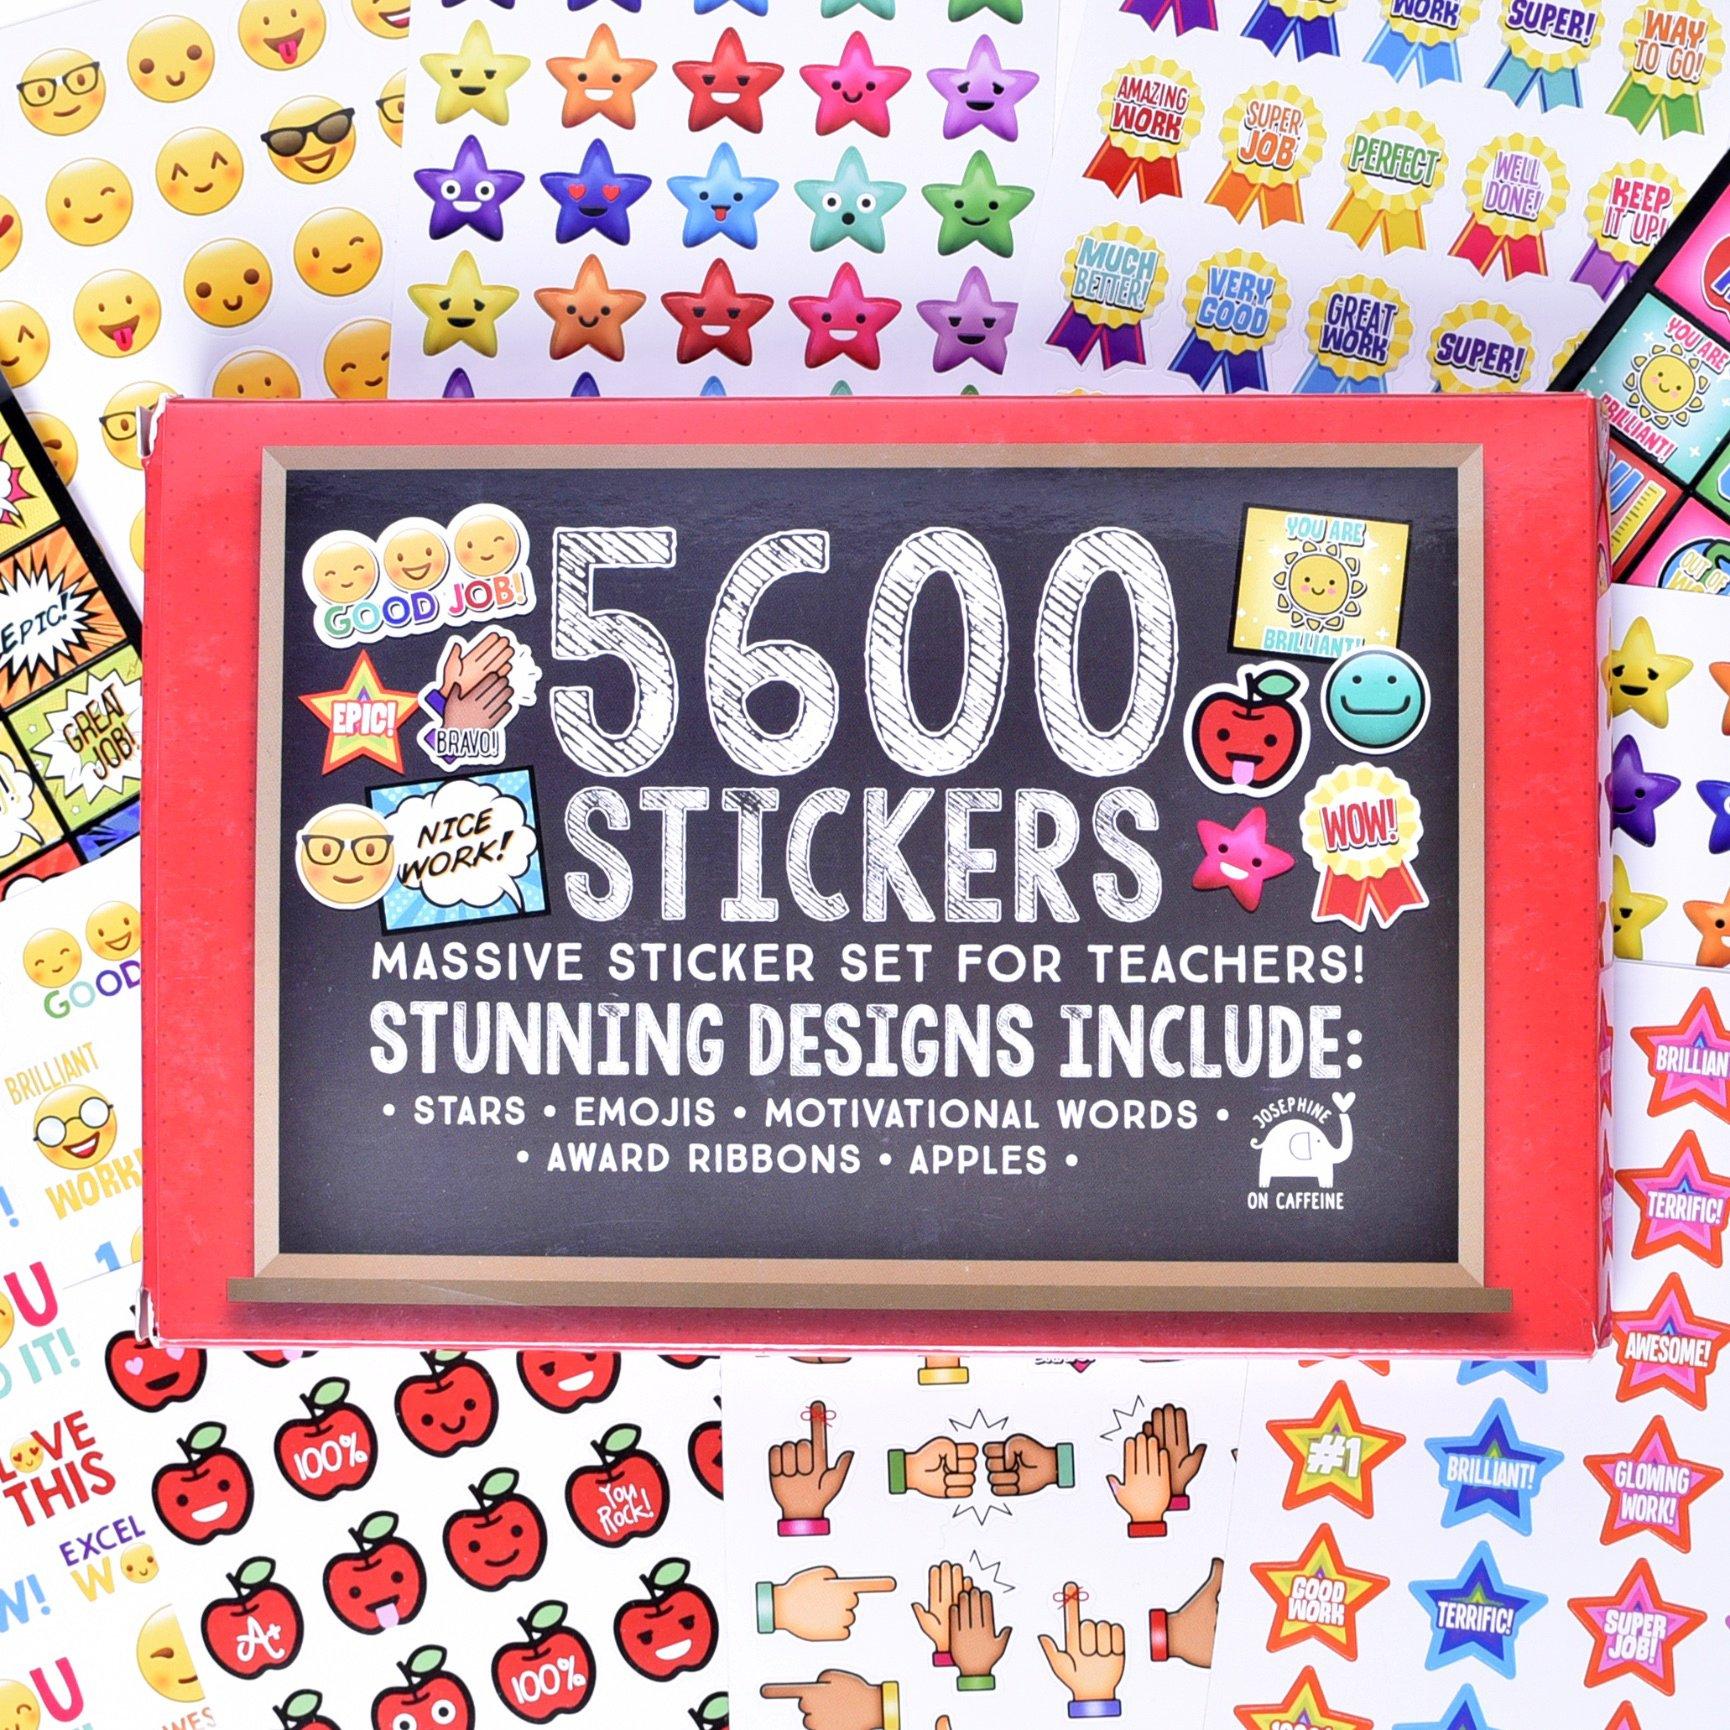 Josephine on Caffeine Teacher Stickers Kids- Bulk Teacher Supplies Value Pack 5600 Reward Stickers Classroom Supplies School Supplies Teachers